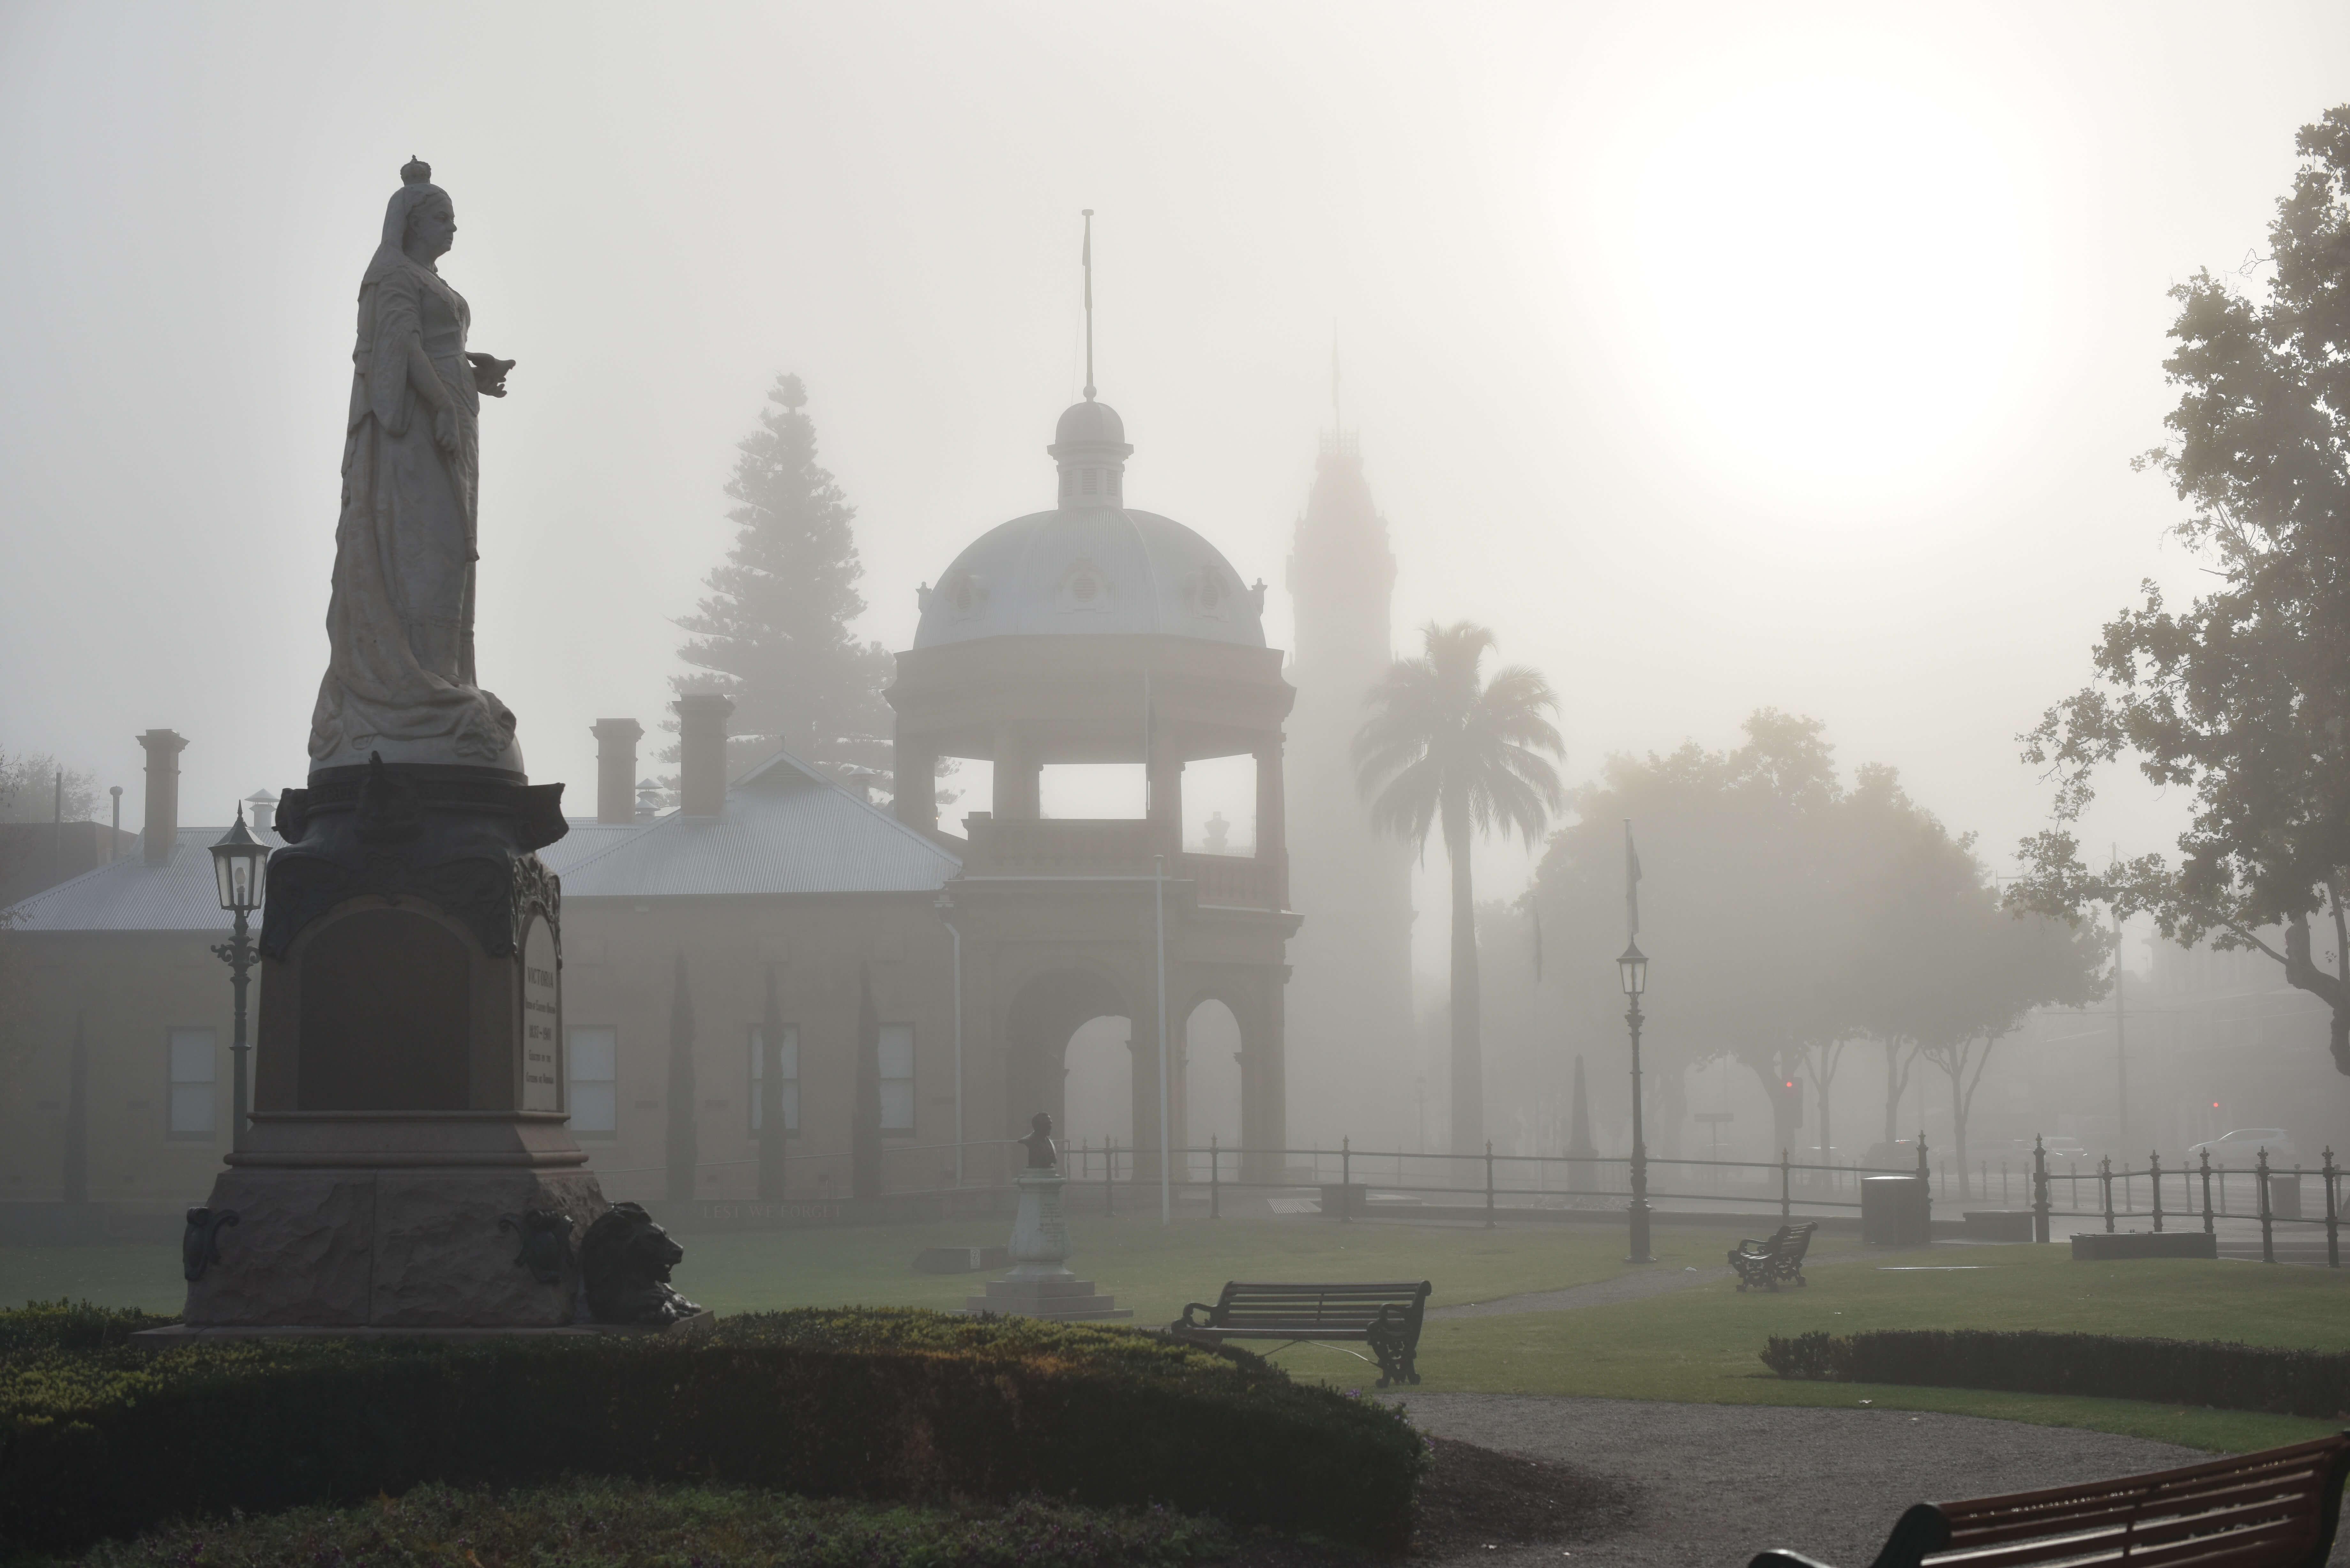 Queen Victoria Monument in Rosalind Park, Bendigo